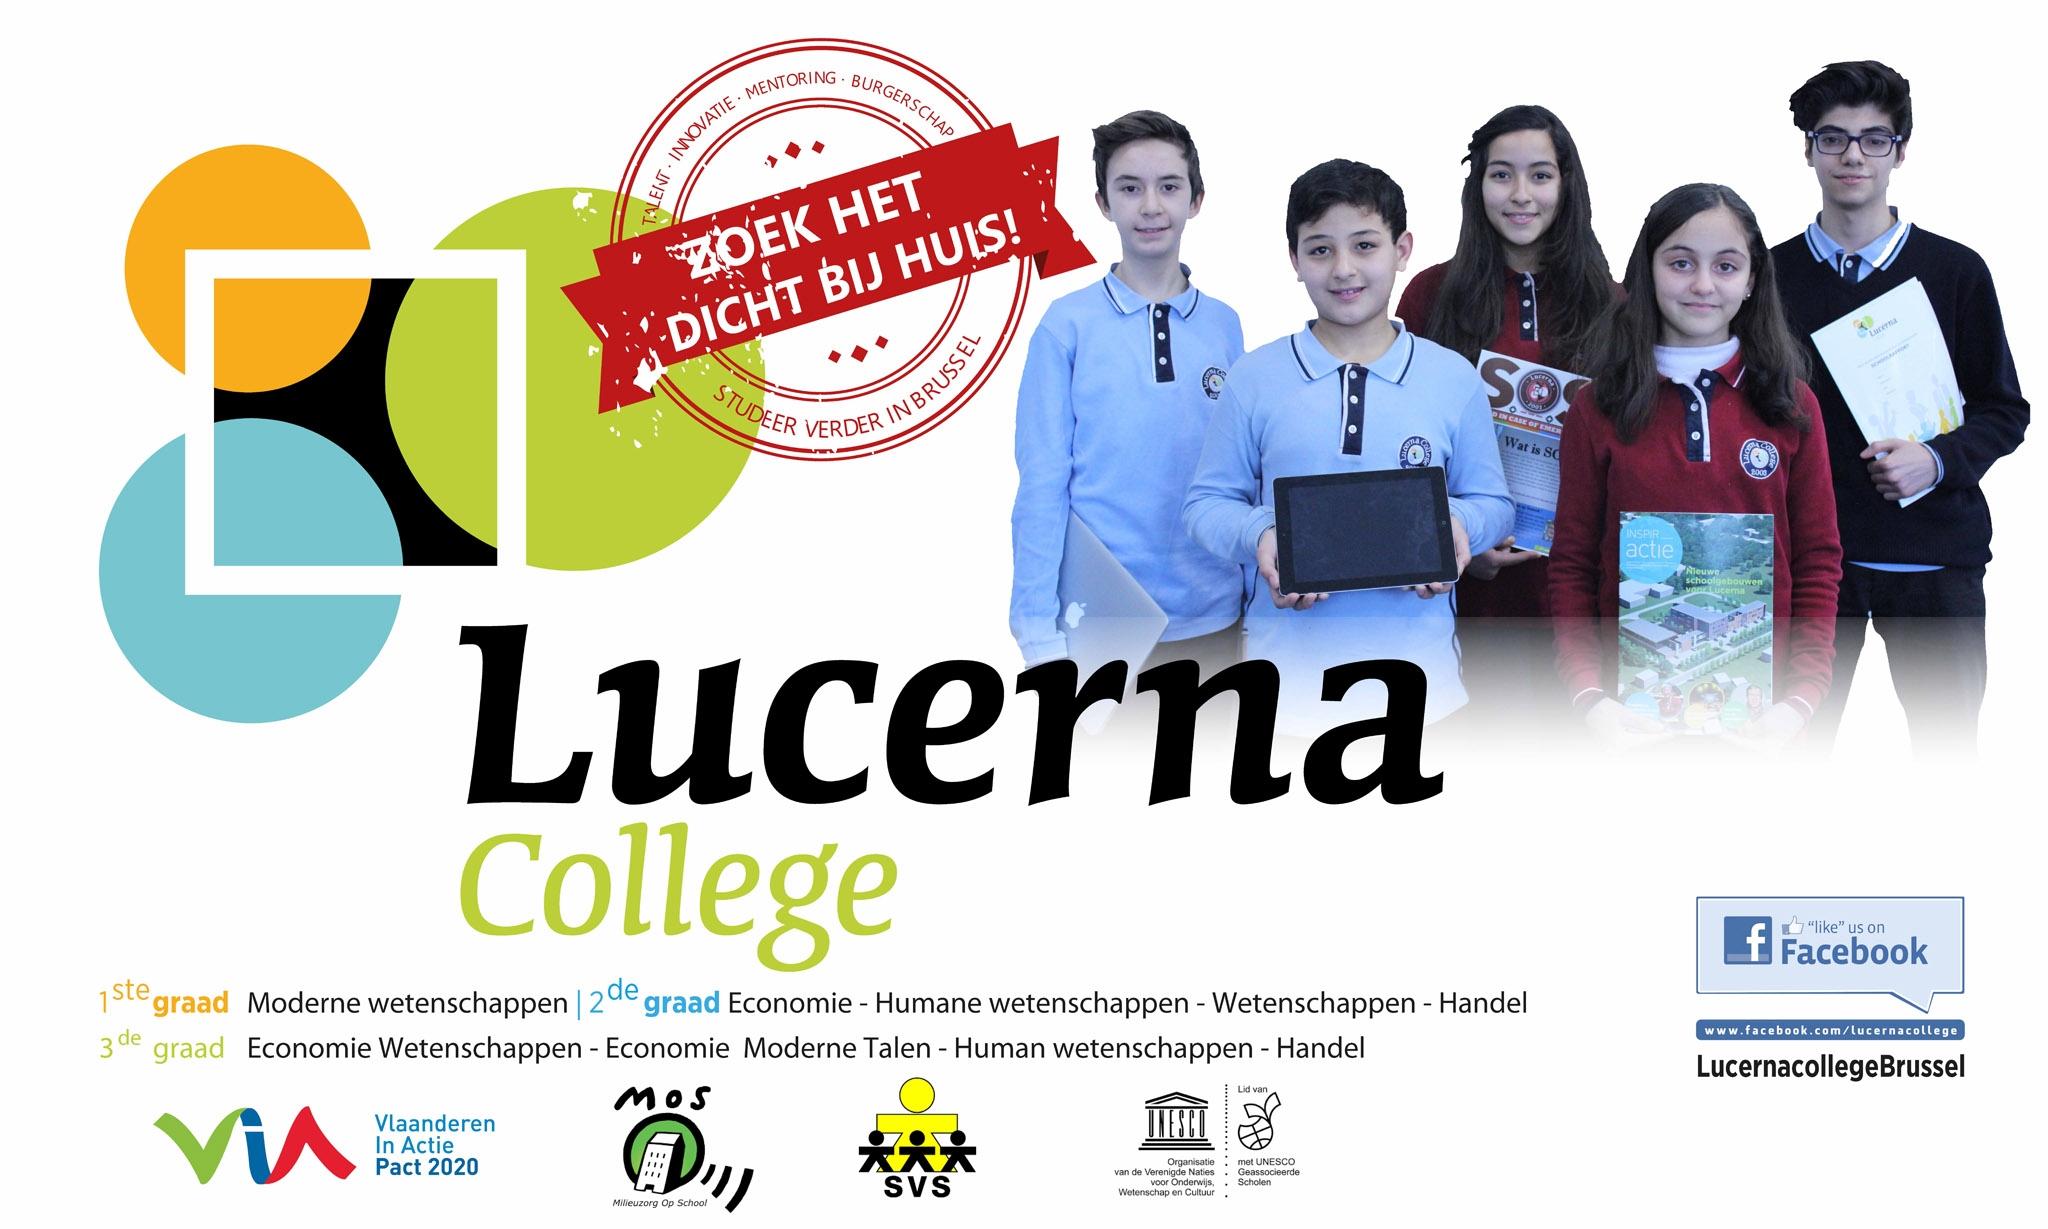 Lucerna—Spandoek-copie